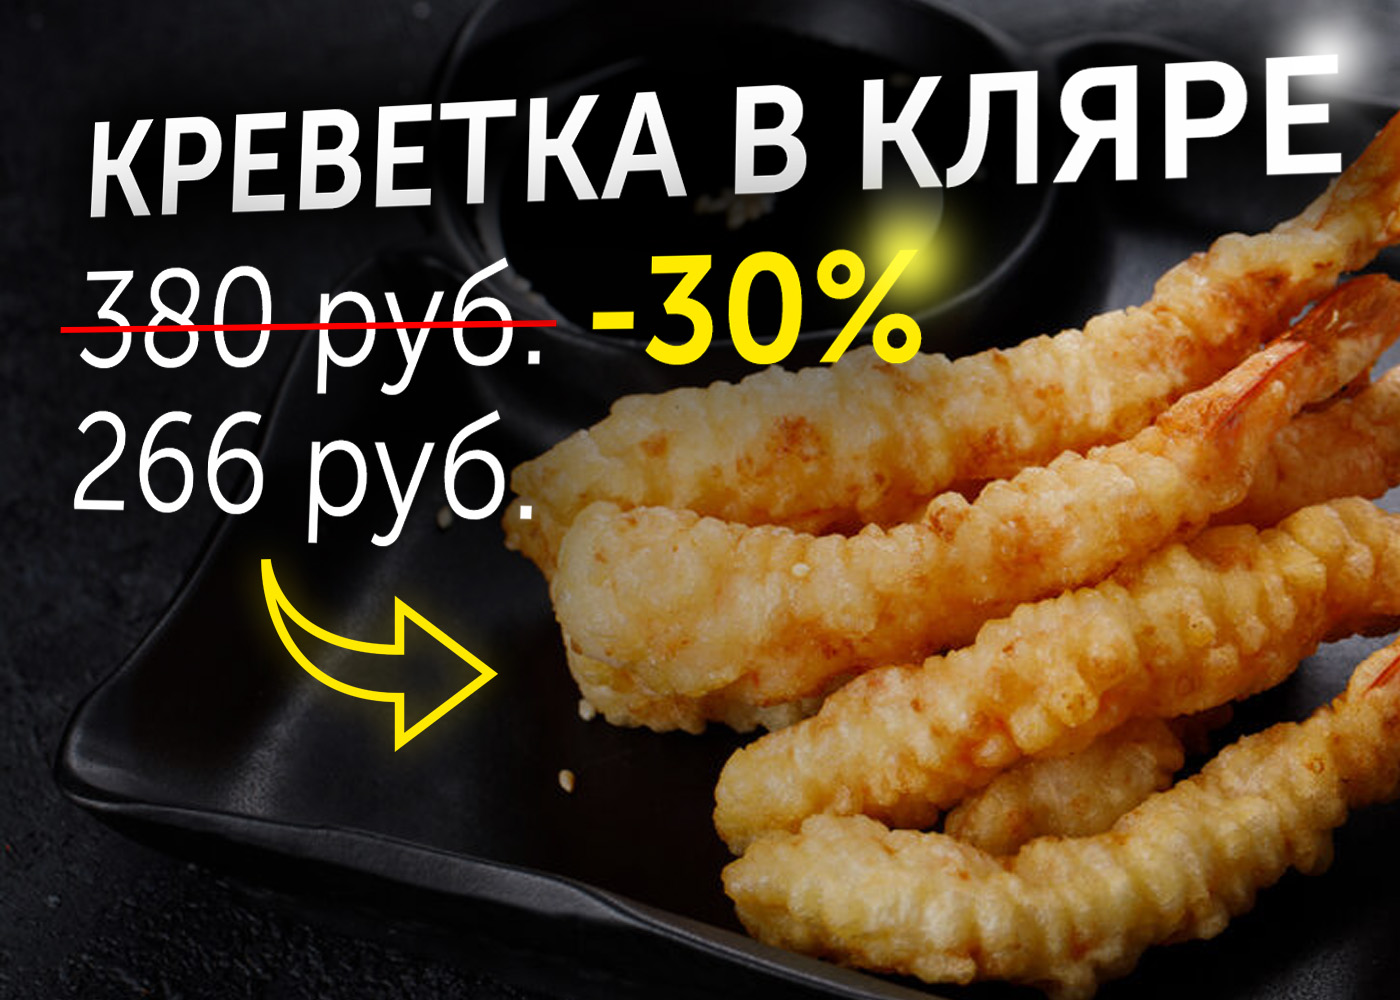 Креветка в кляре – скидка 30%